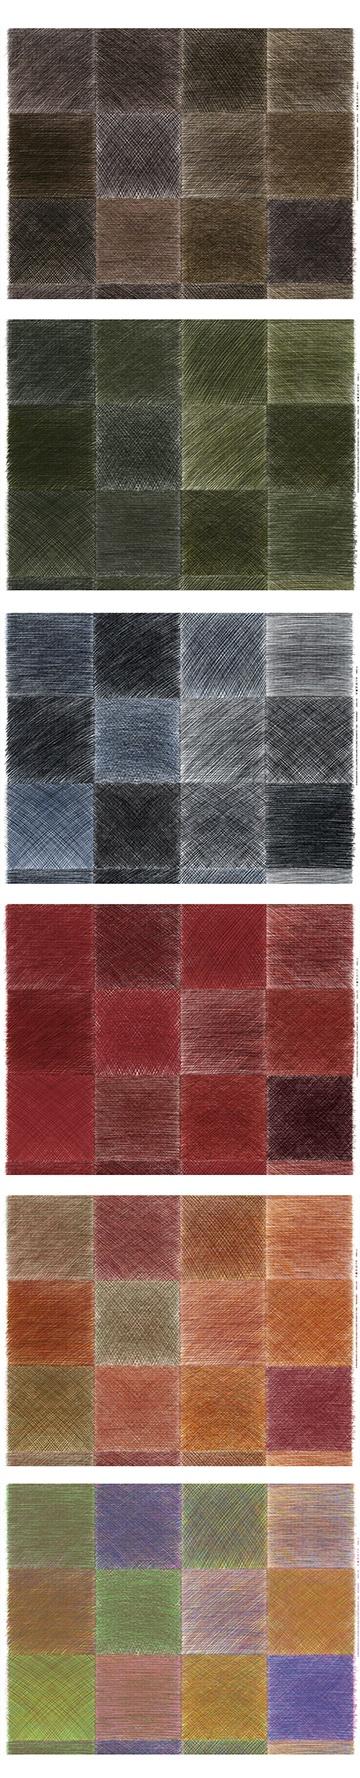 I love these designs by Fujiwo Ishimoto for Marimekko.